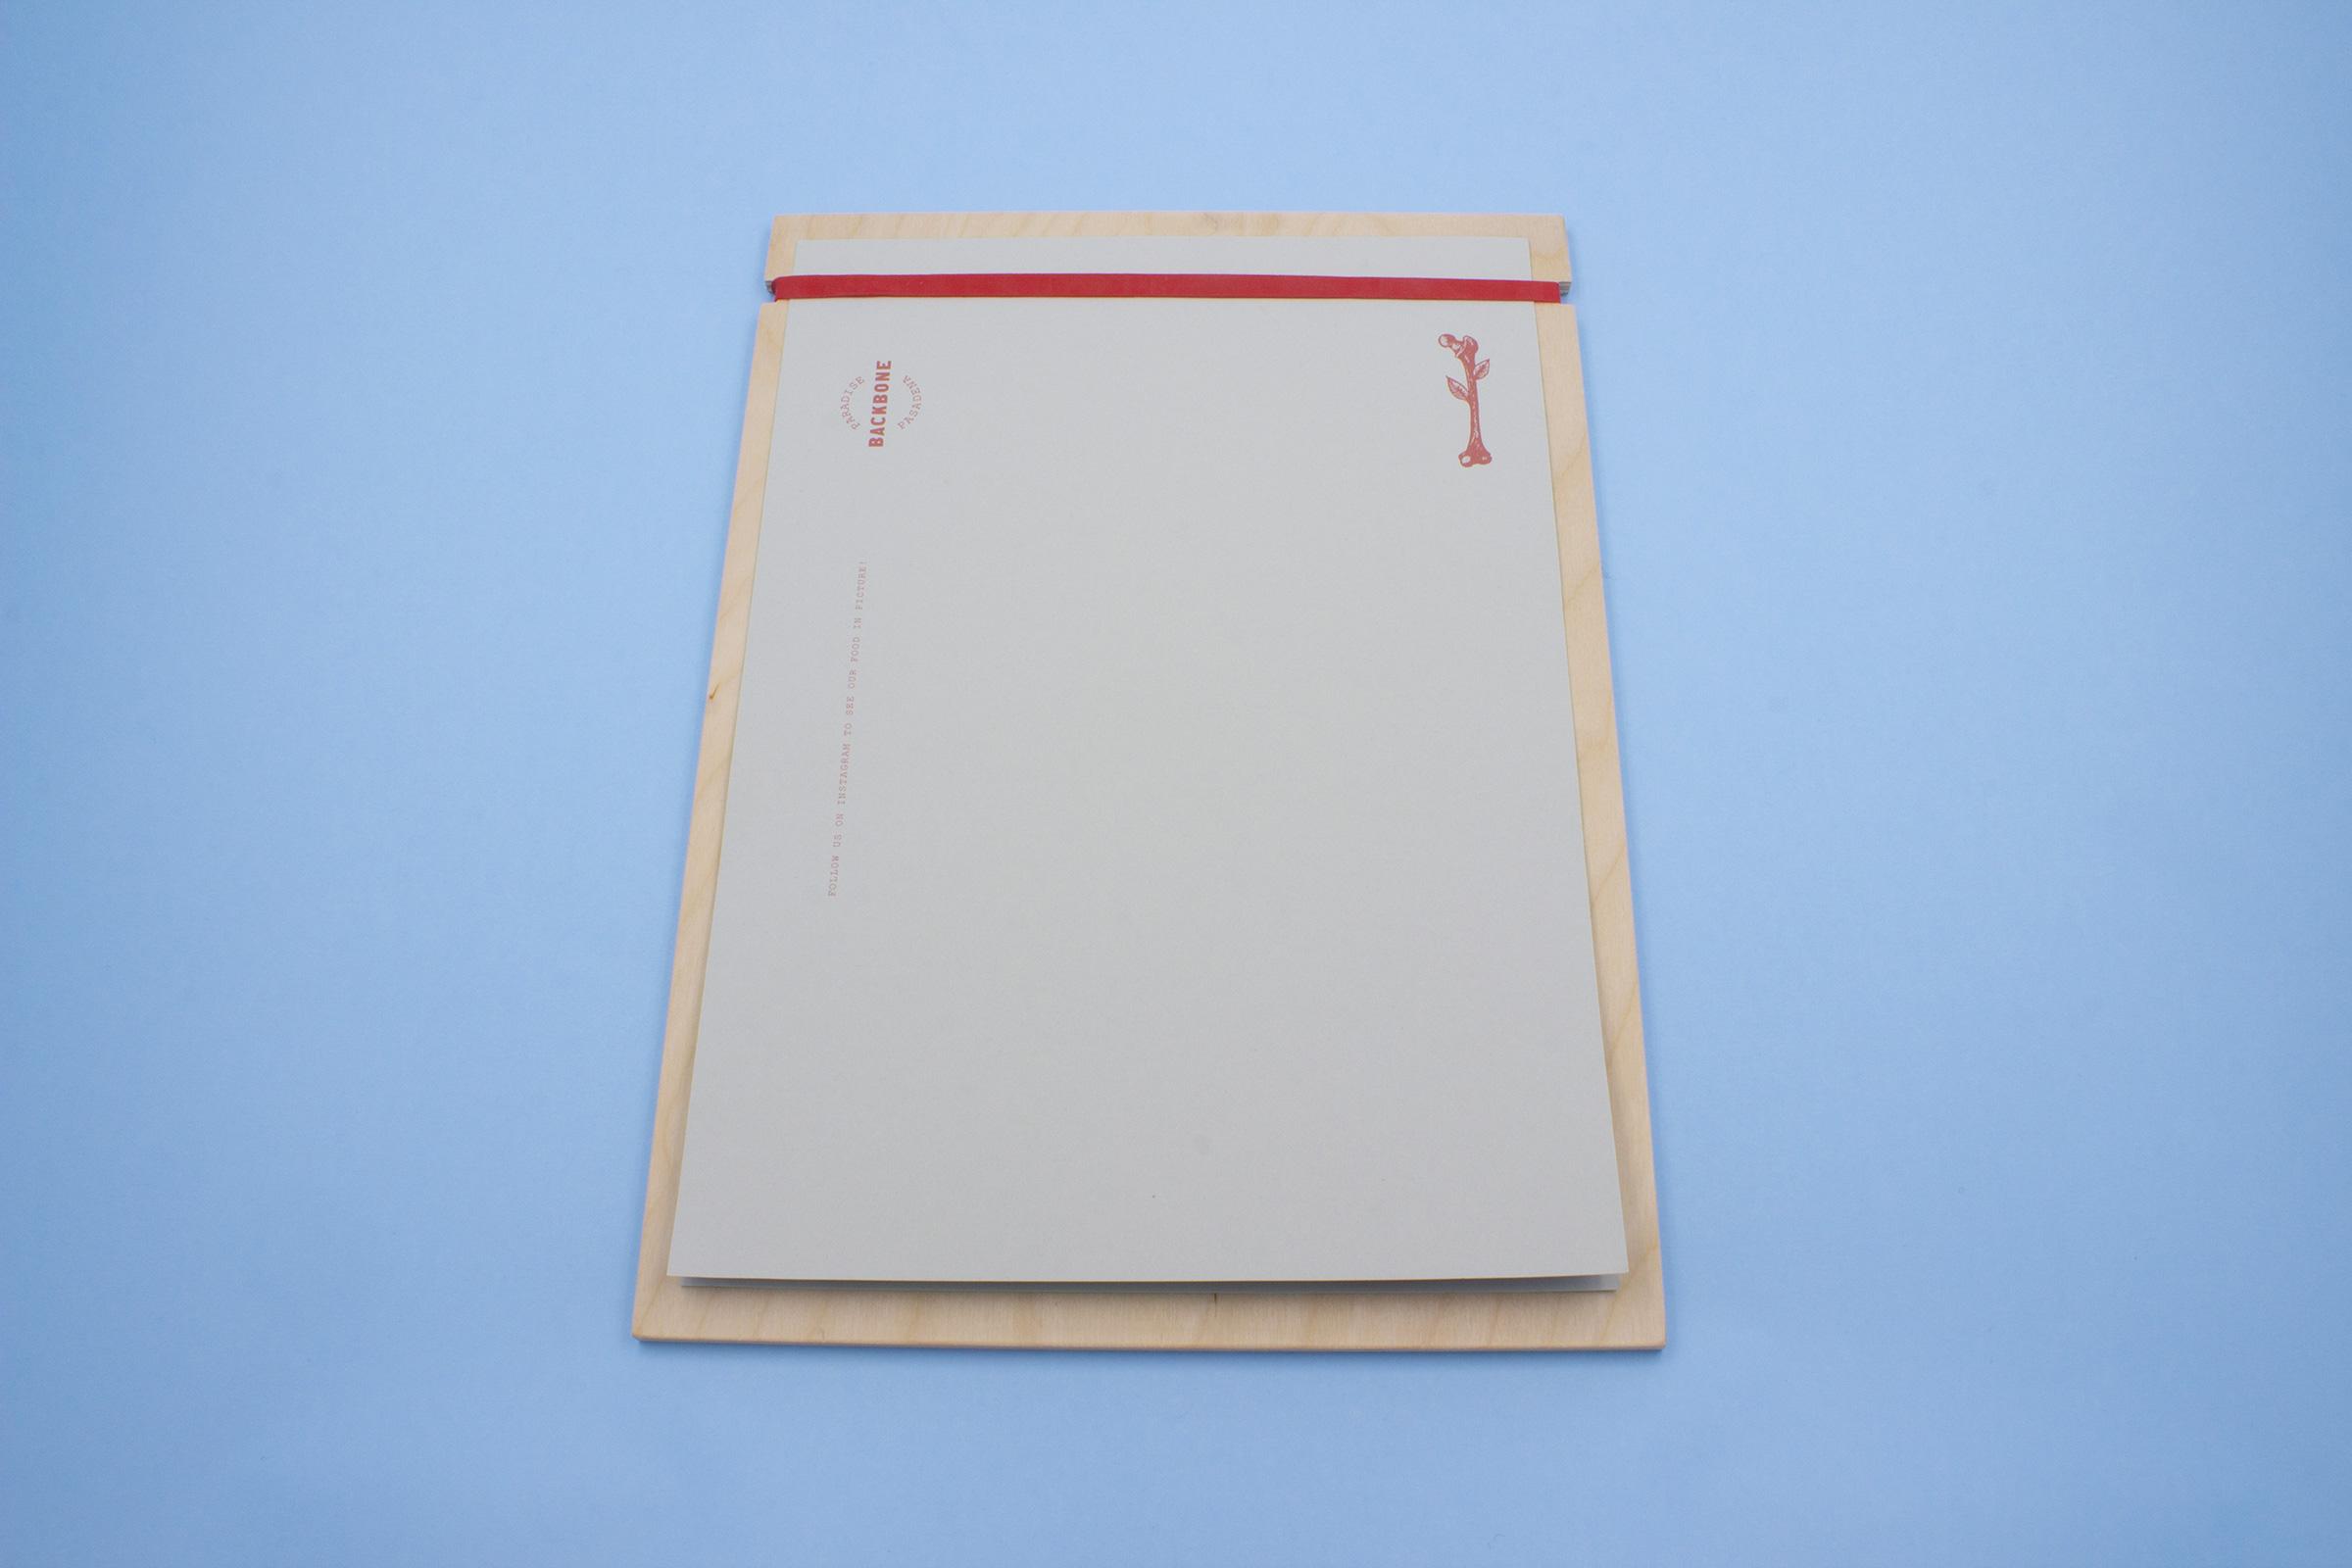 TABLE-TOP-AZZURRO-01